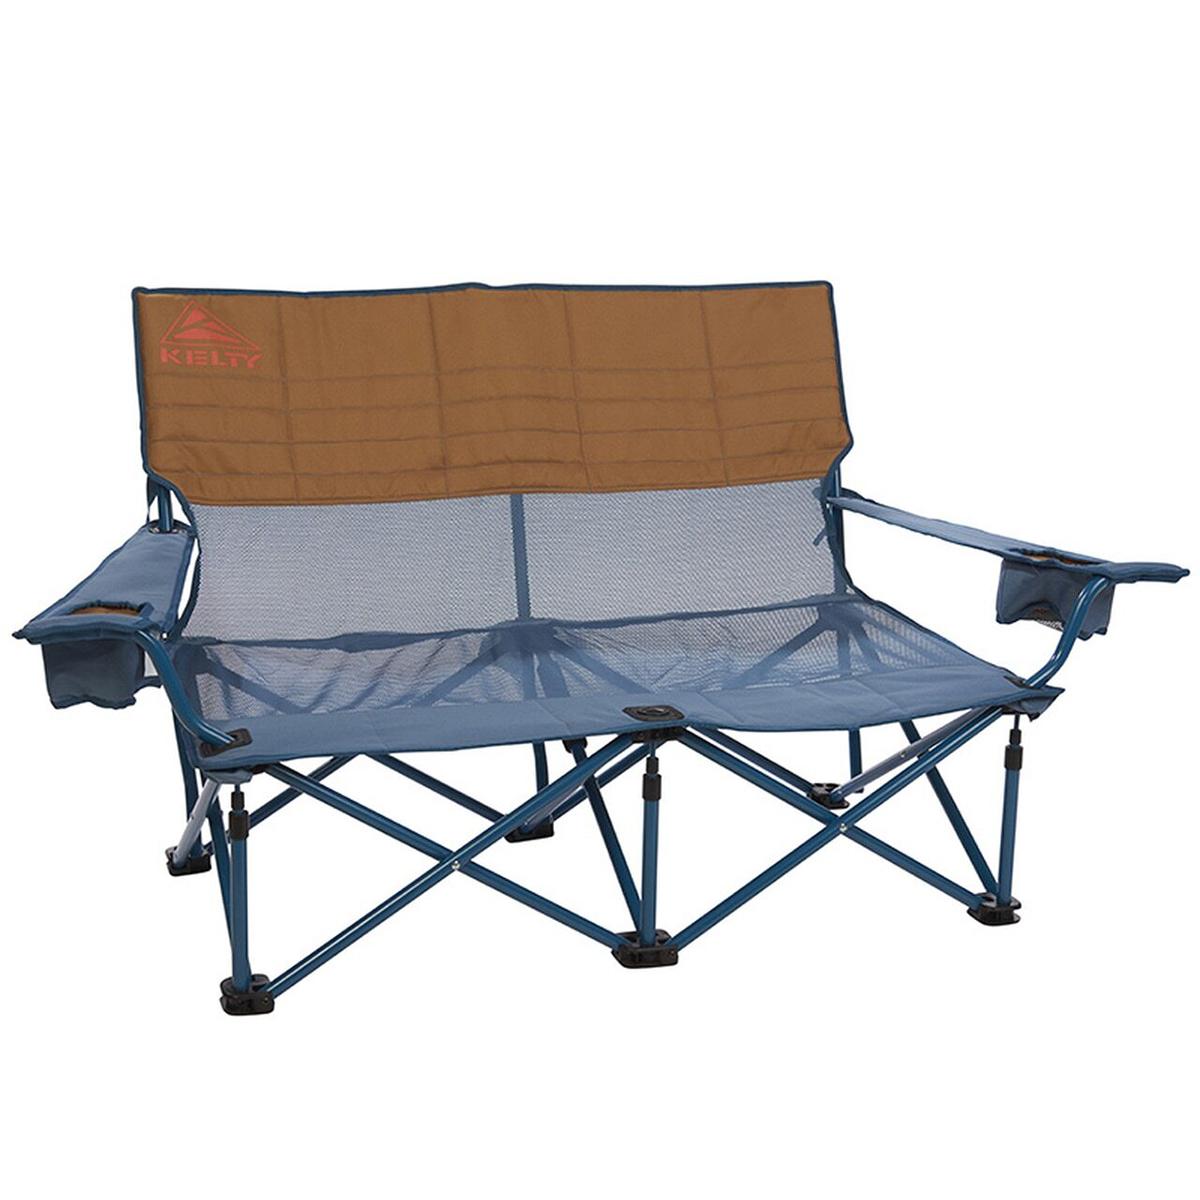 Kelty Mesh Low Loveseat Unisex Adventure Gear Camping Chair